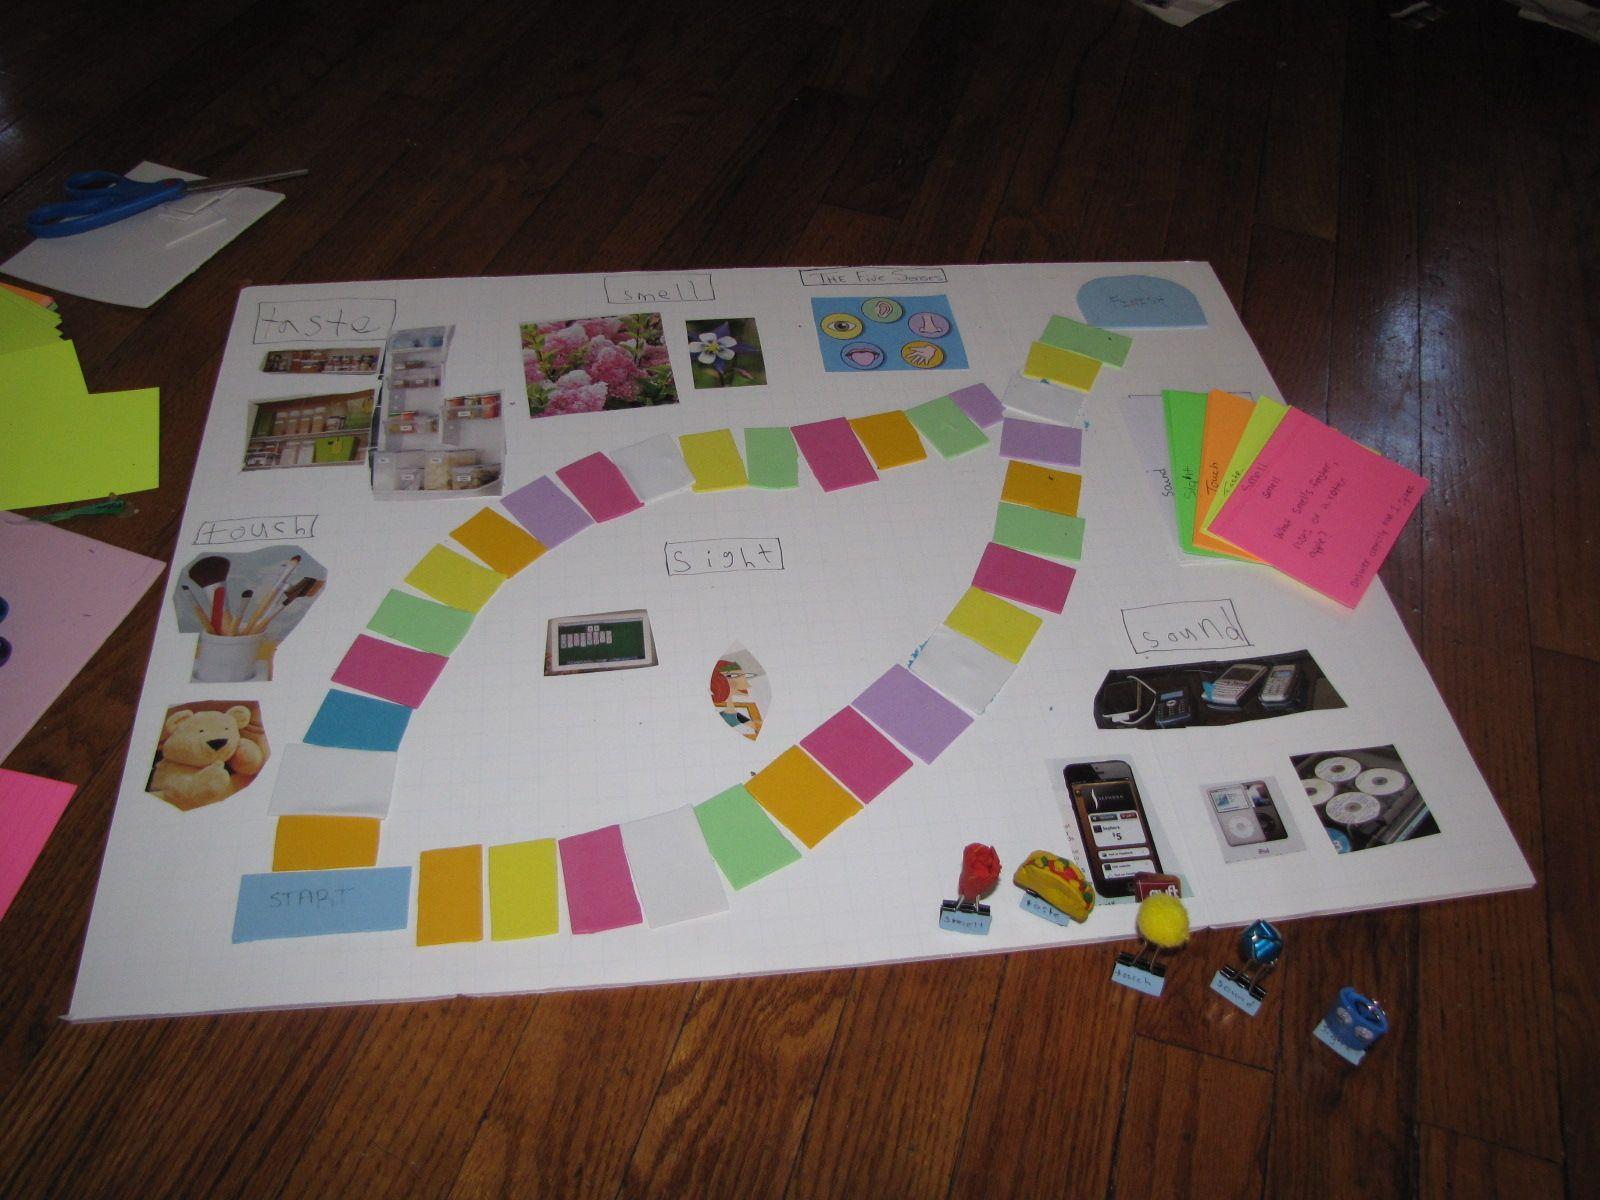 The 5 Senses Board Game